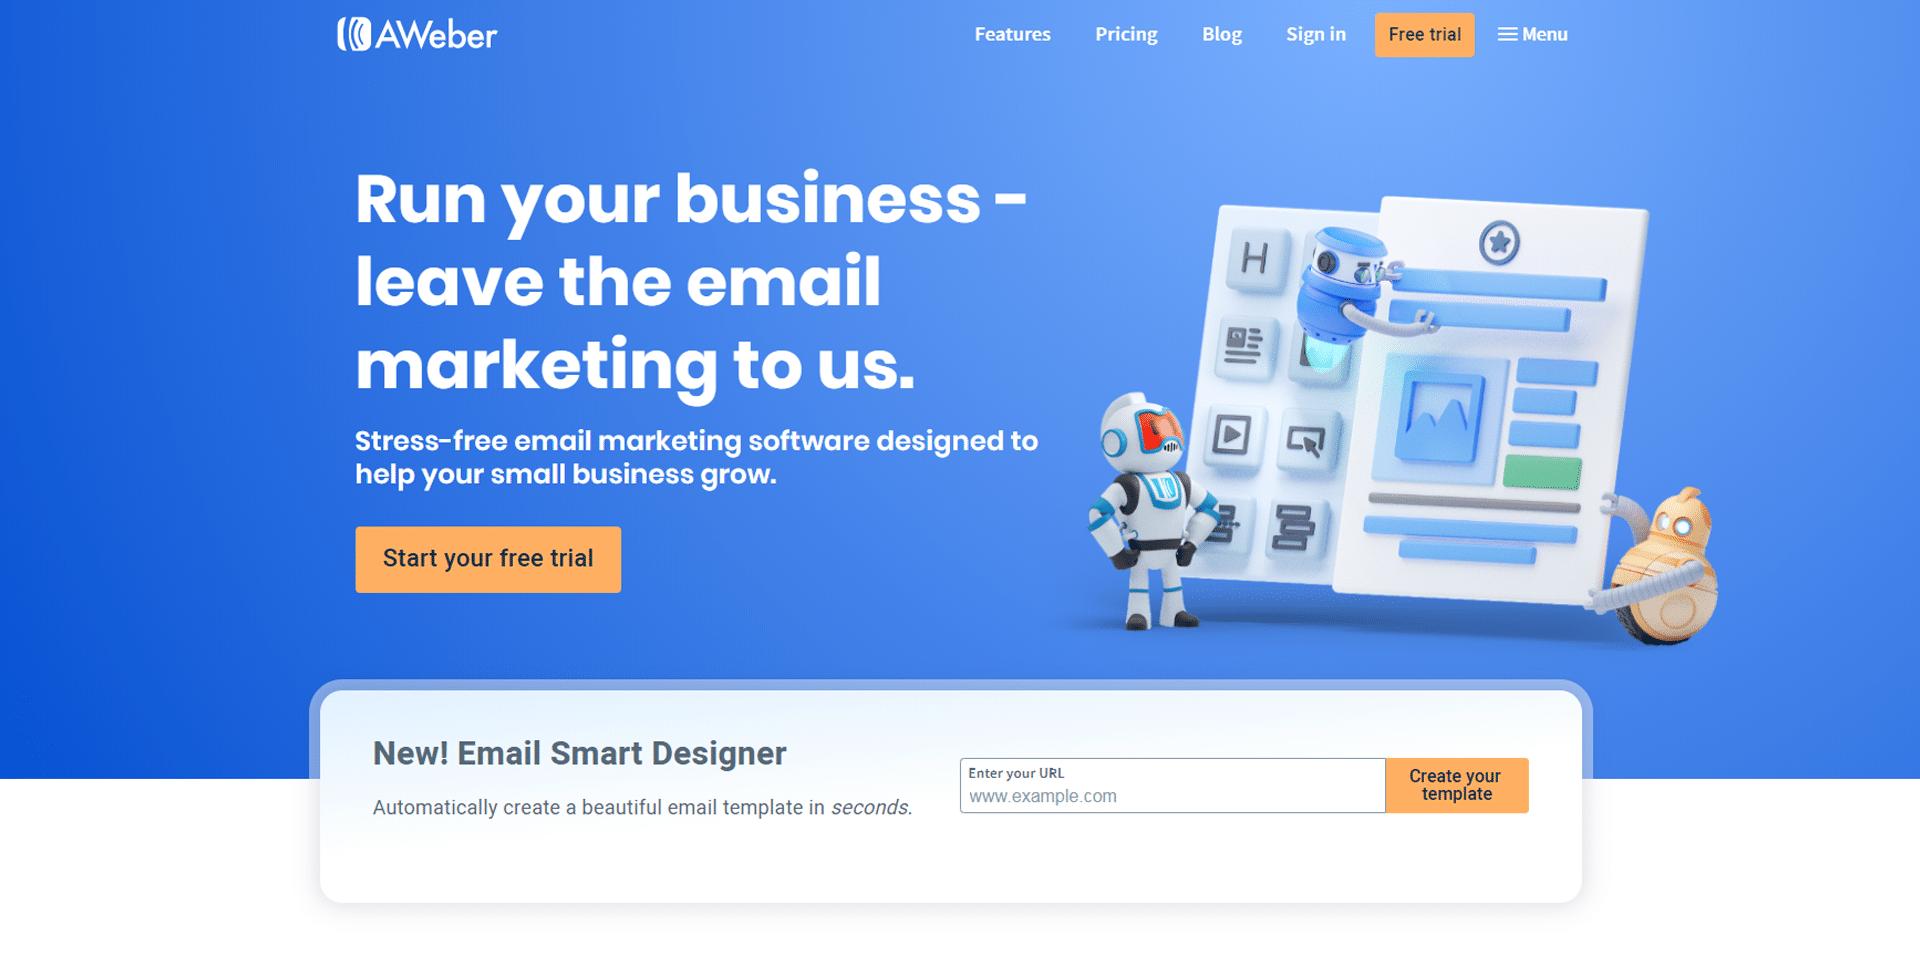 email marketing tools - aweber